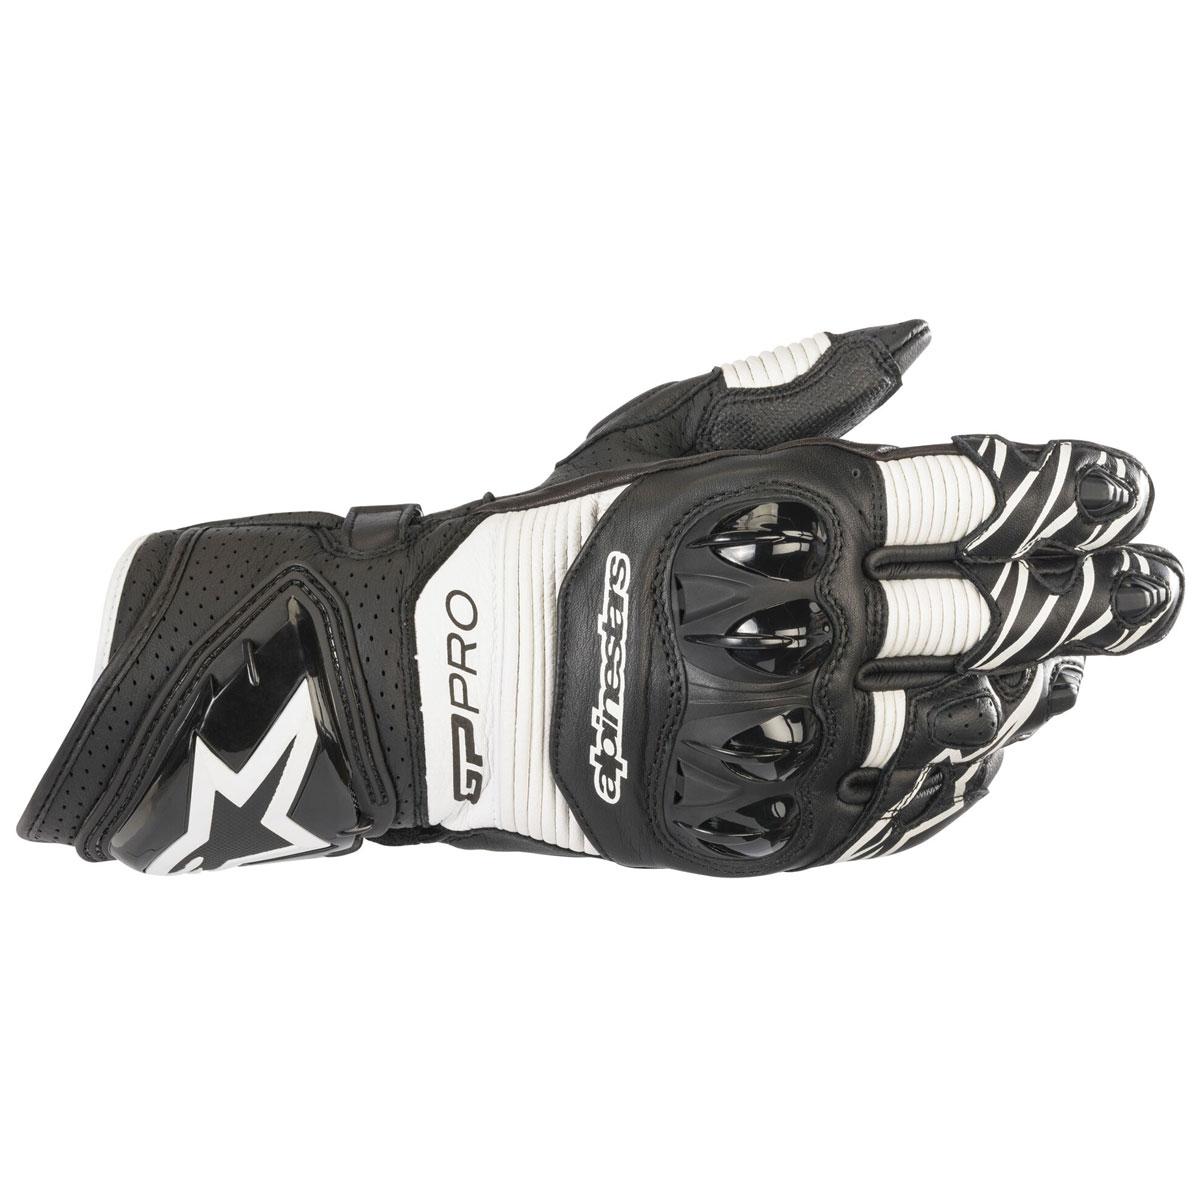 Alpinestars Men's GP Pro R3 Black/White Leather Gloves